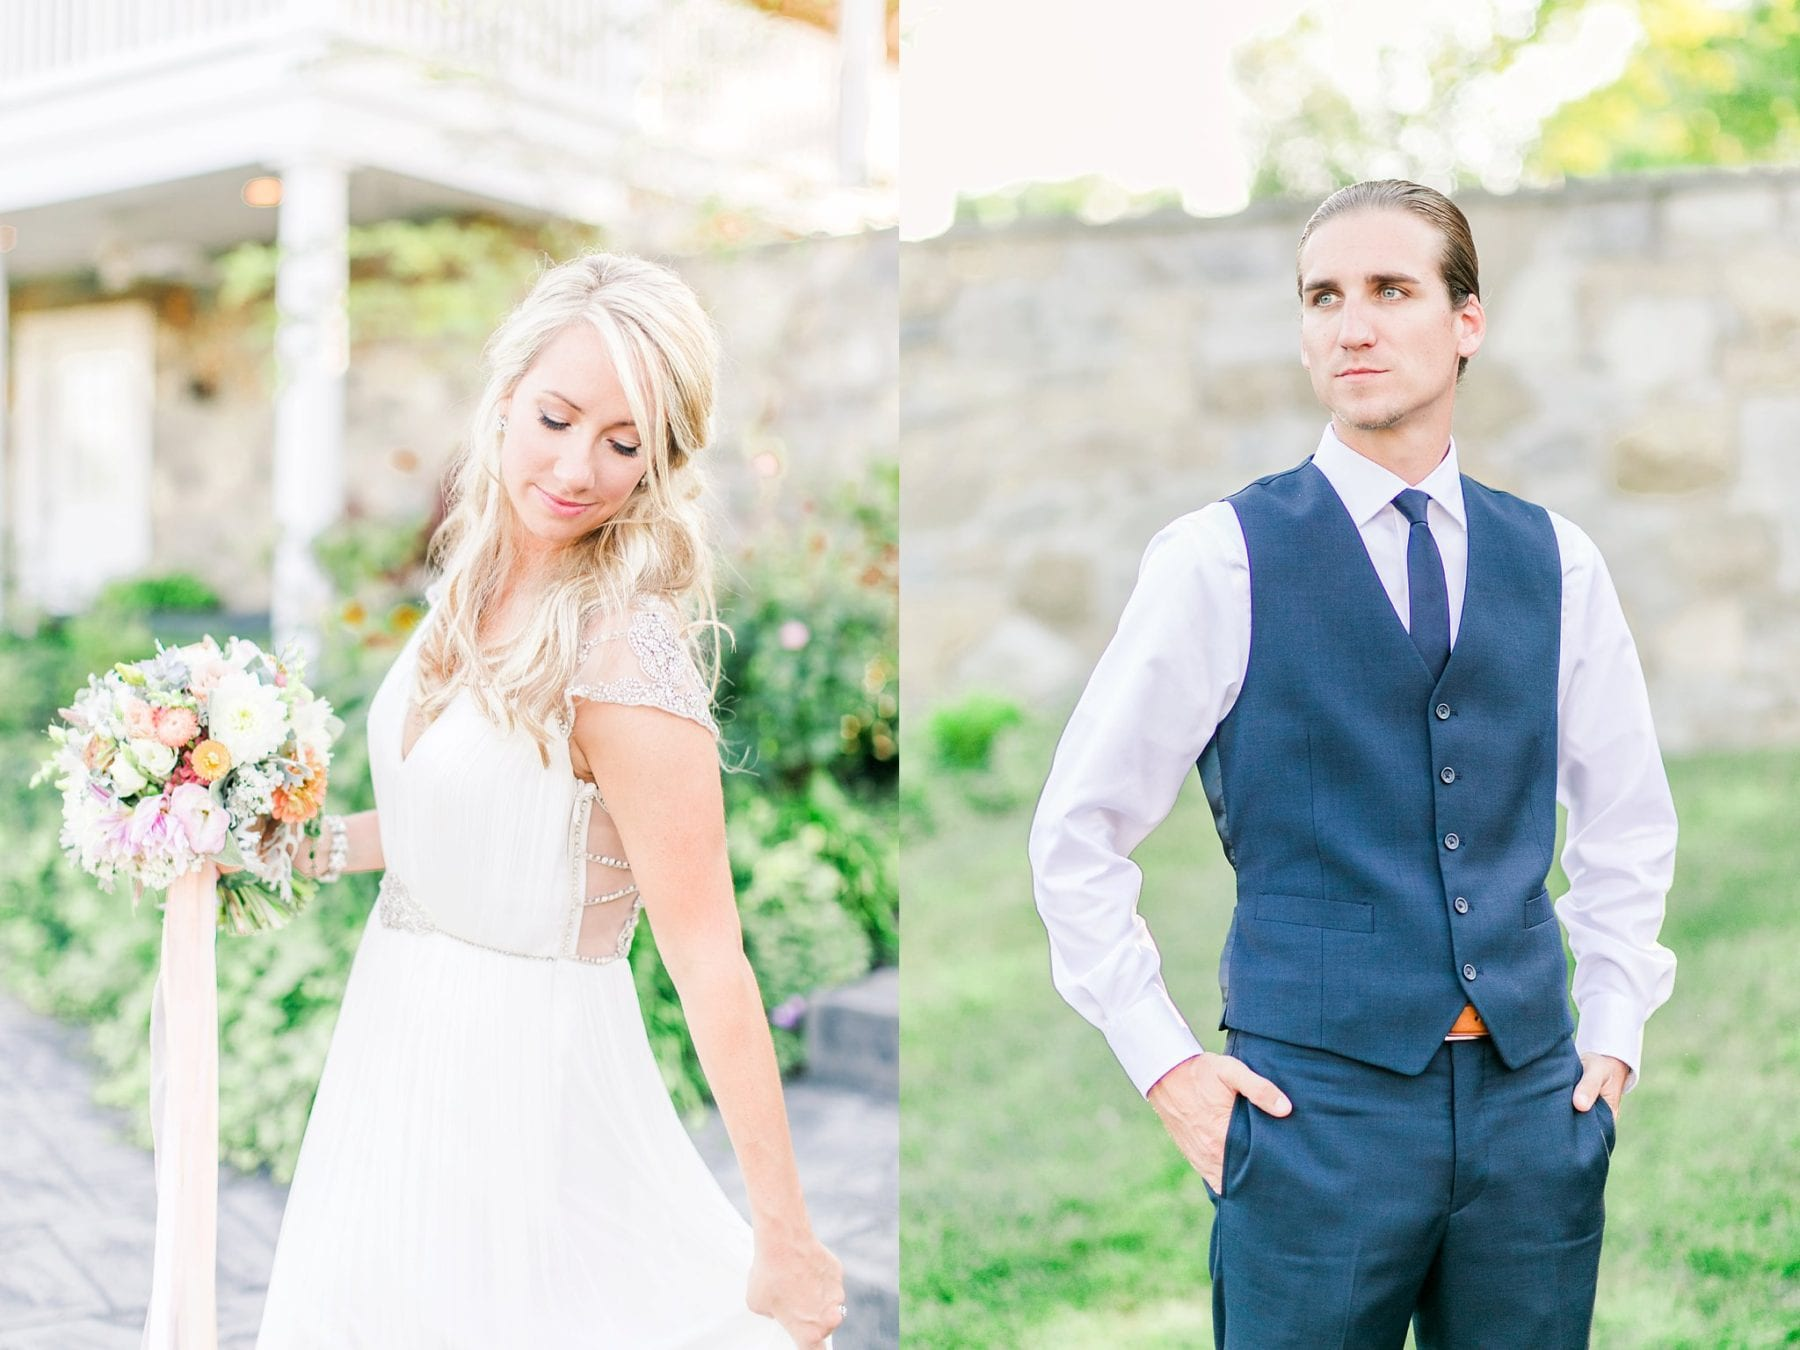 Pond View Farm Wedding Photos Maryland Wedding Photographer Kristen & Ryan Megan Kelsey Photography Blog-221.jpg